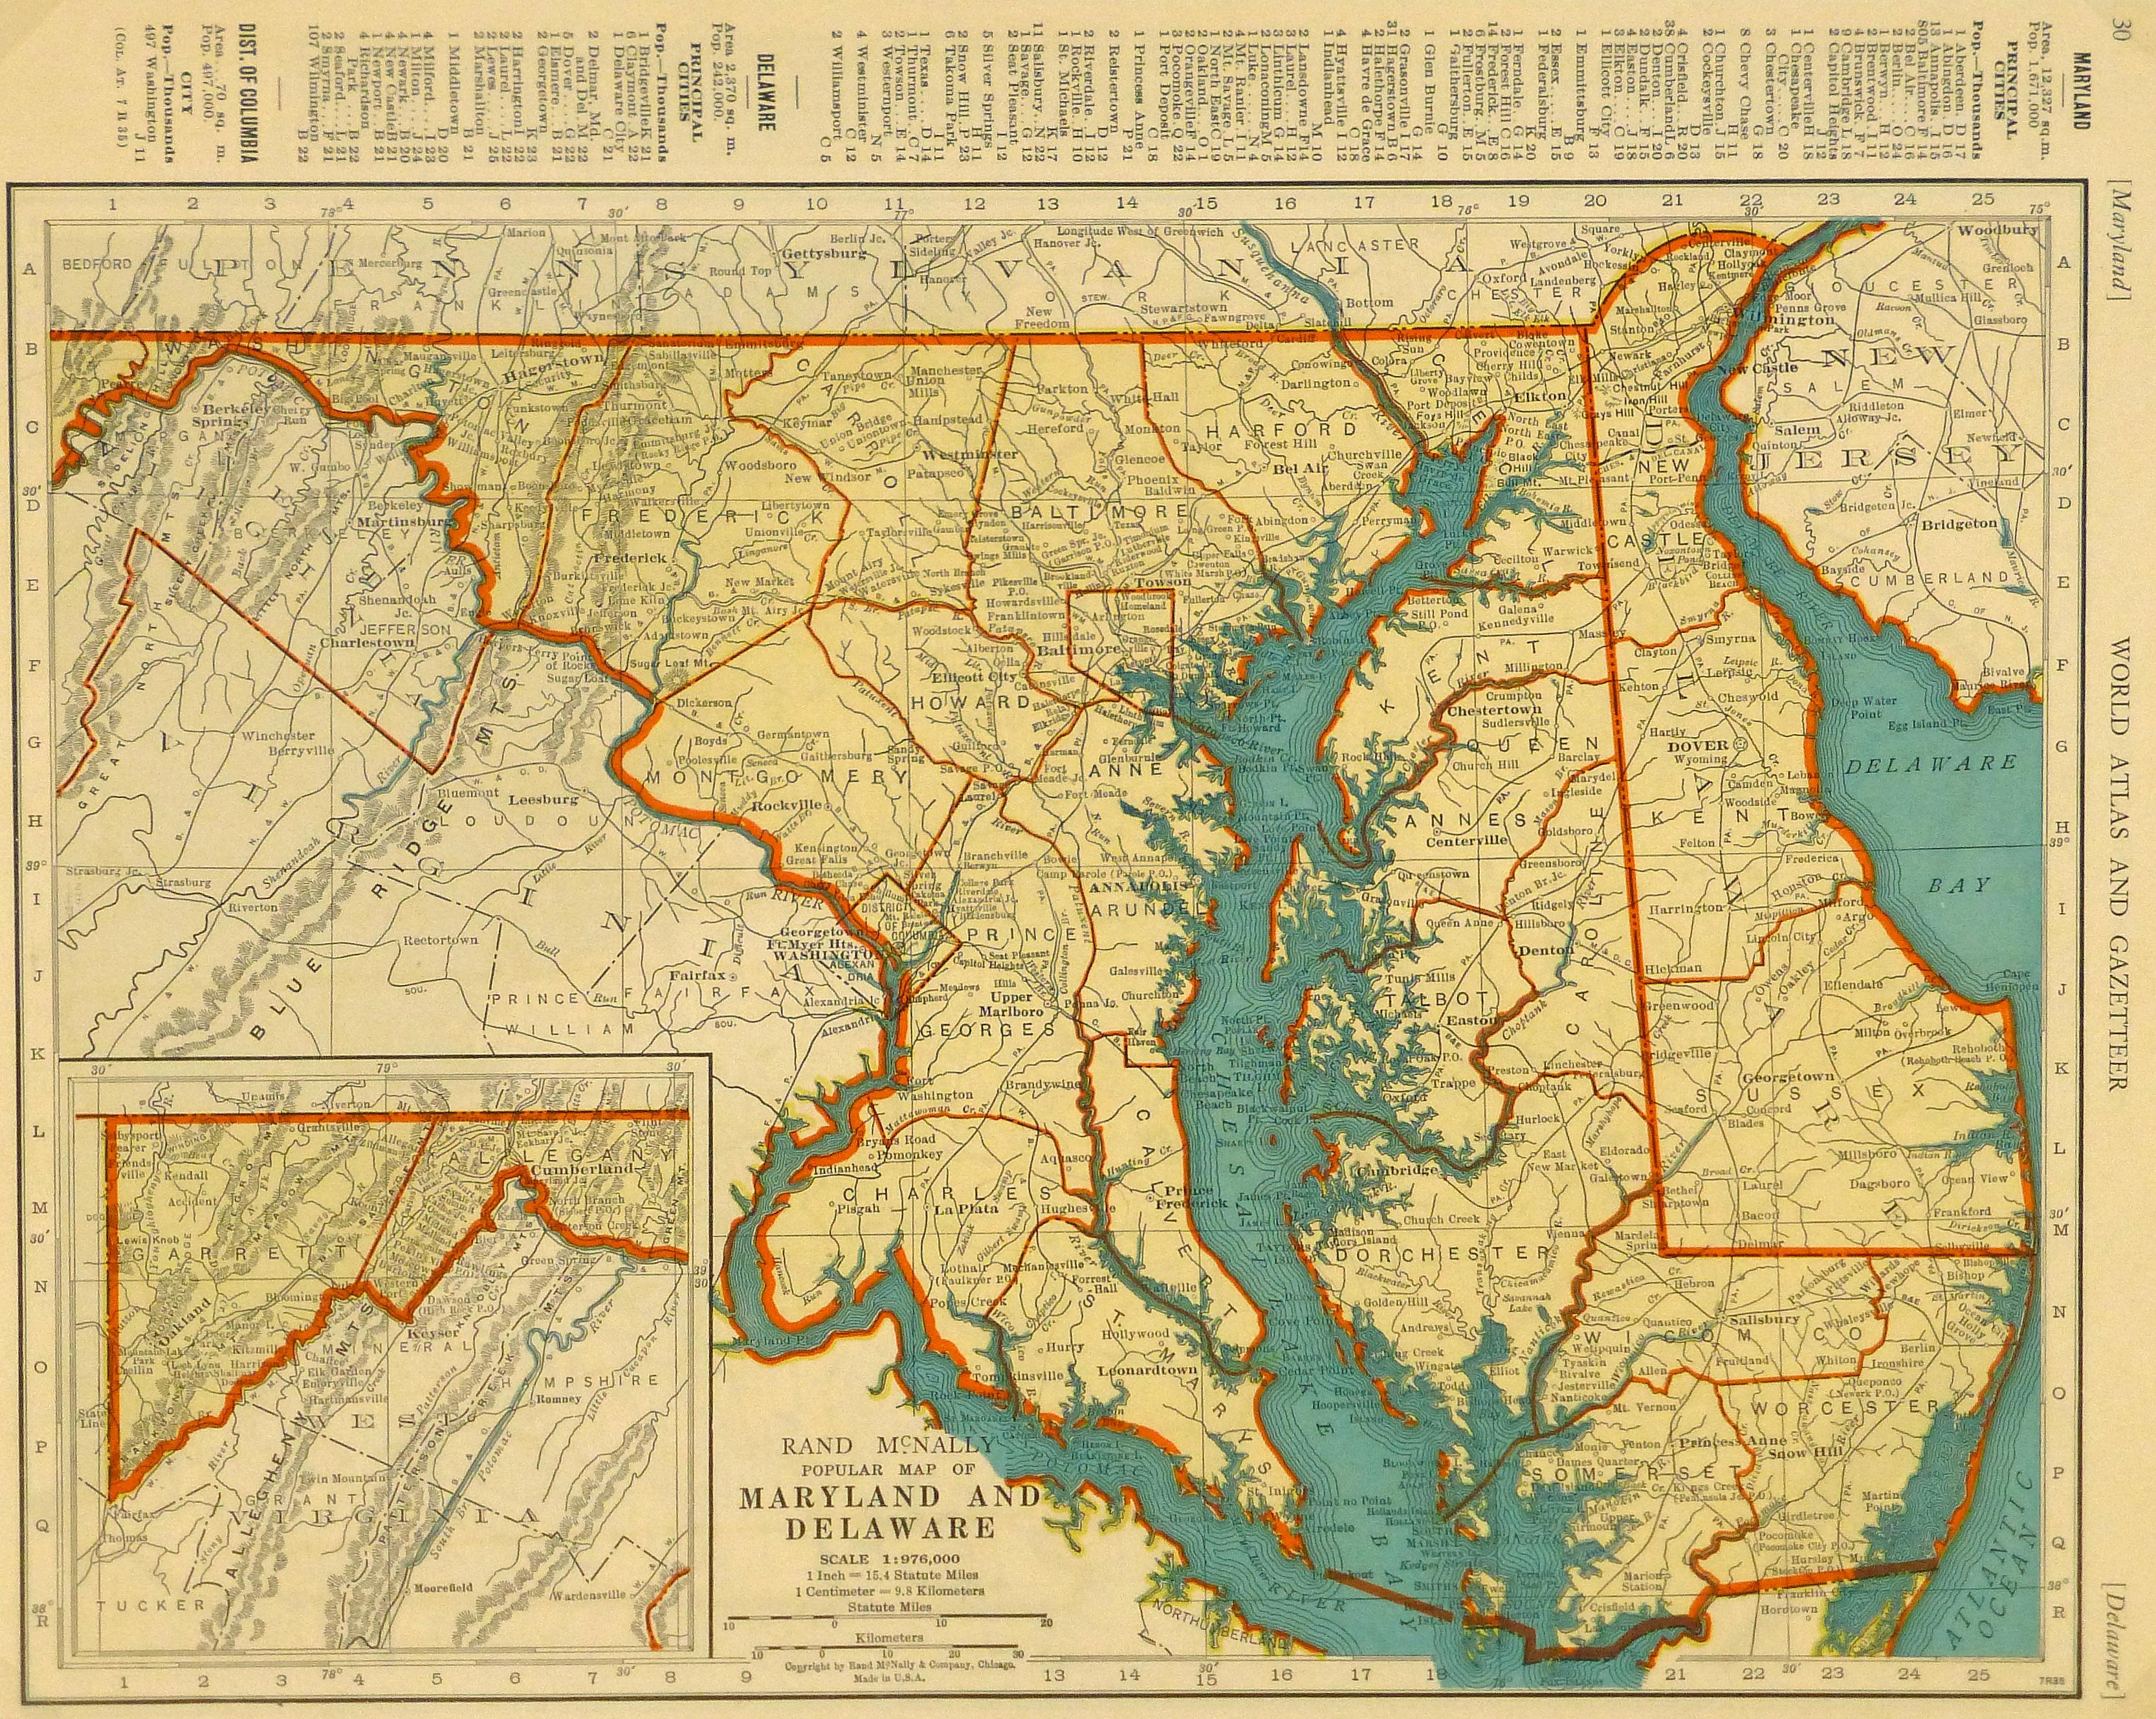 Map of Maryland & Delaware, 1937 - Original Art, Antique Maps & Prints